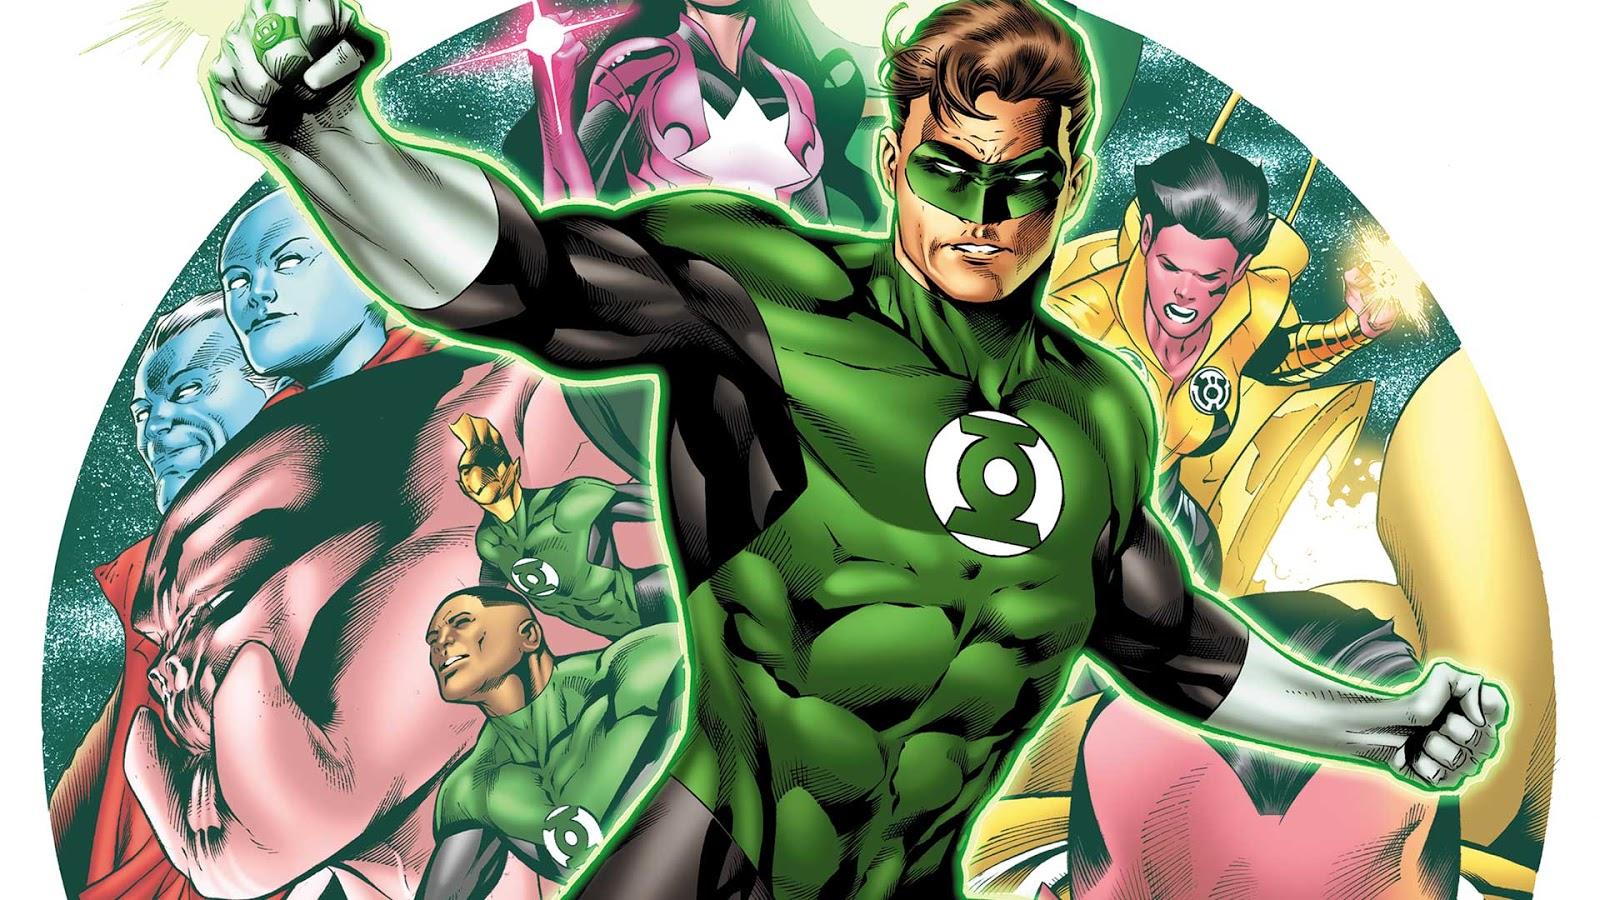 Green Lantern Comic Wallpaper: Weird Science DC Comics: Hal Jordan And The Green Lantern